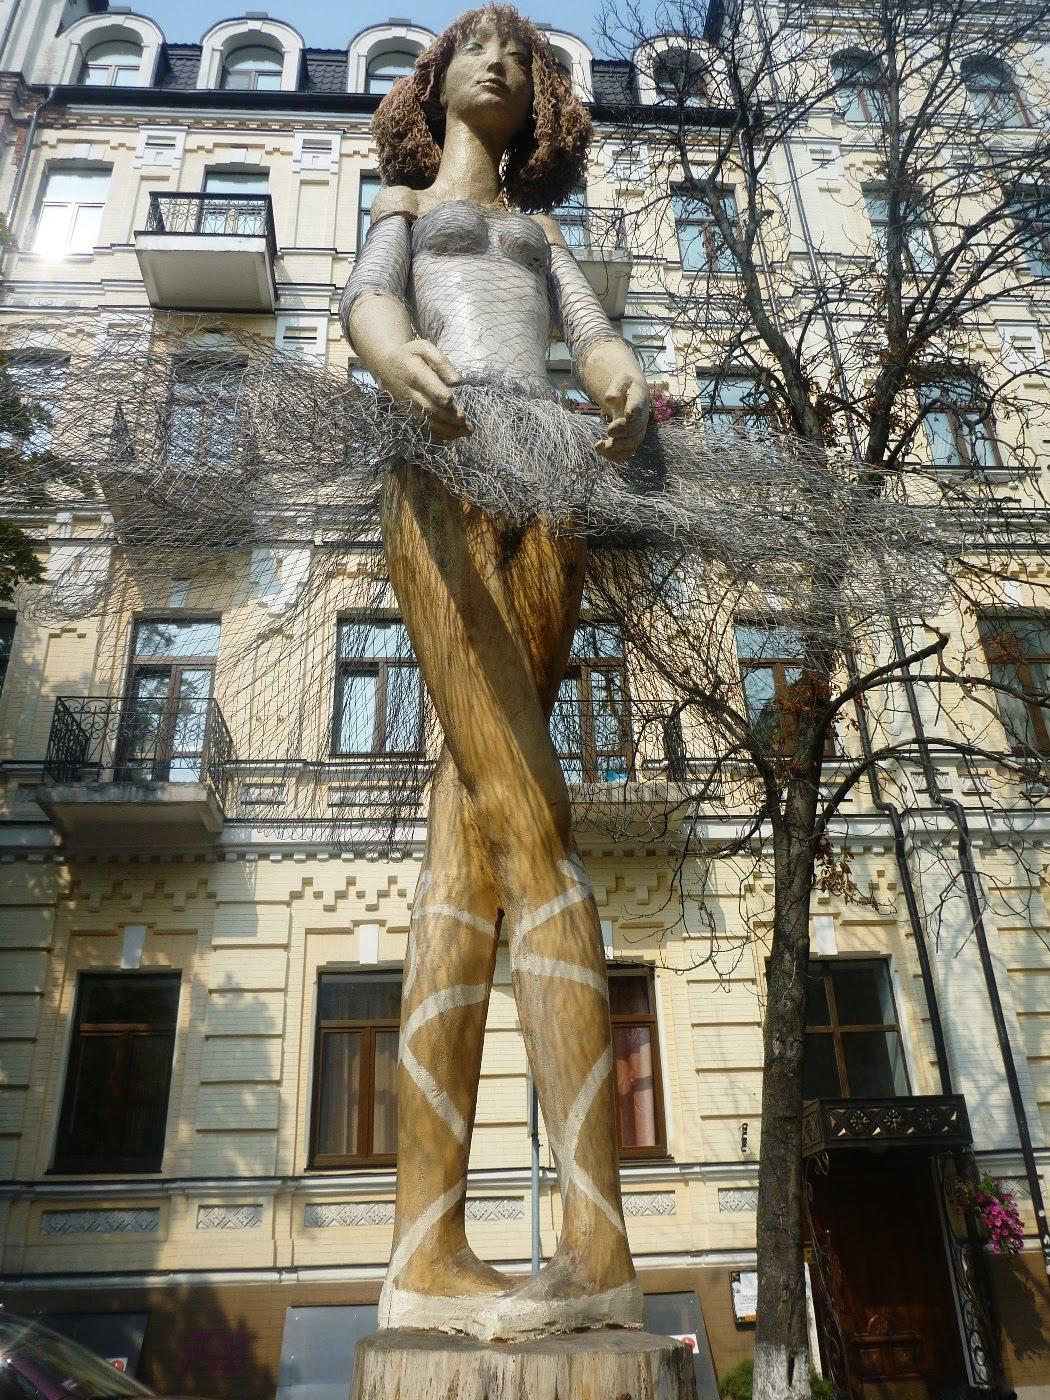 http://1.bp.blogspot.com/_vOS8CAWX1LY/THQZD3Lf8eI/AAAAAAAABlg/_oVvHEX-VvE/s1600/balerina+kozeli2.JPG